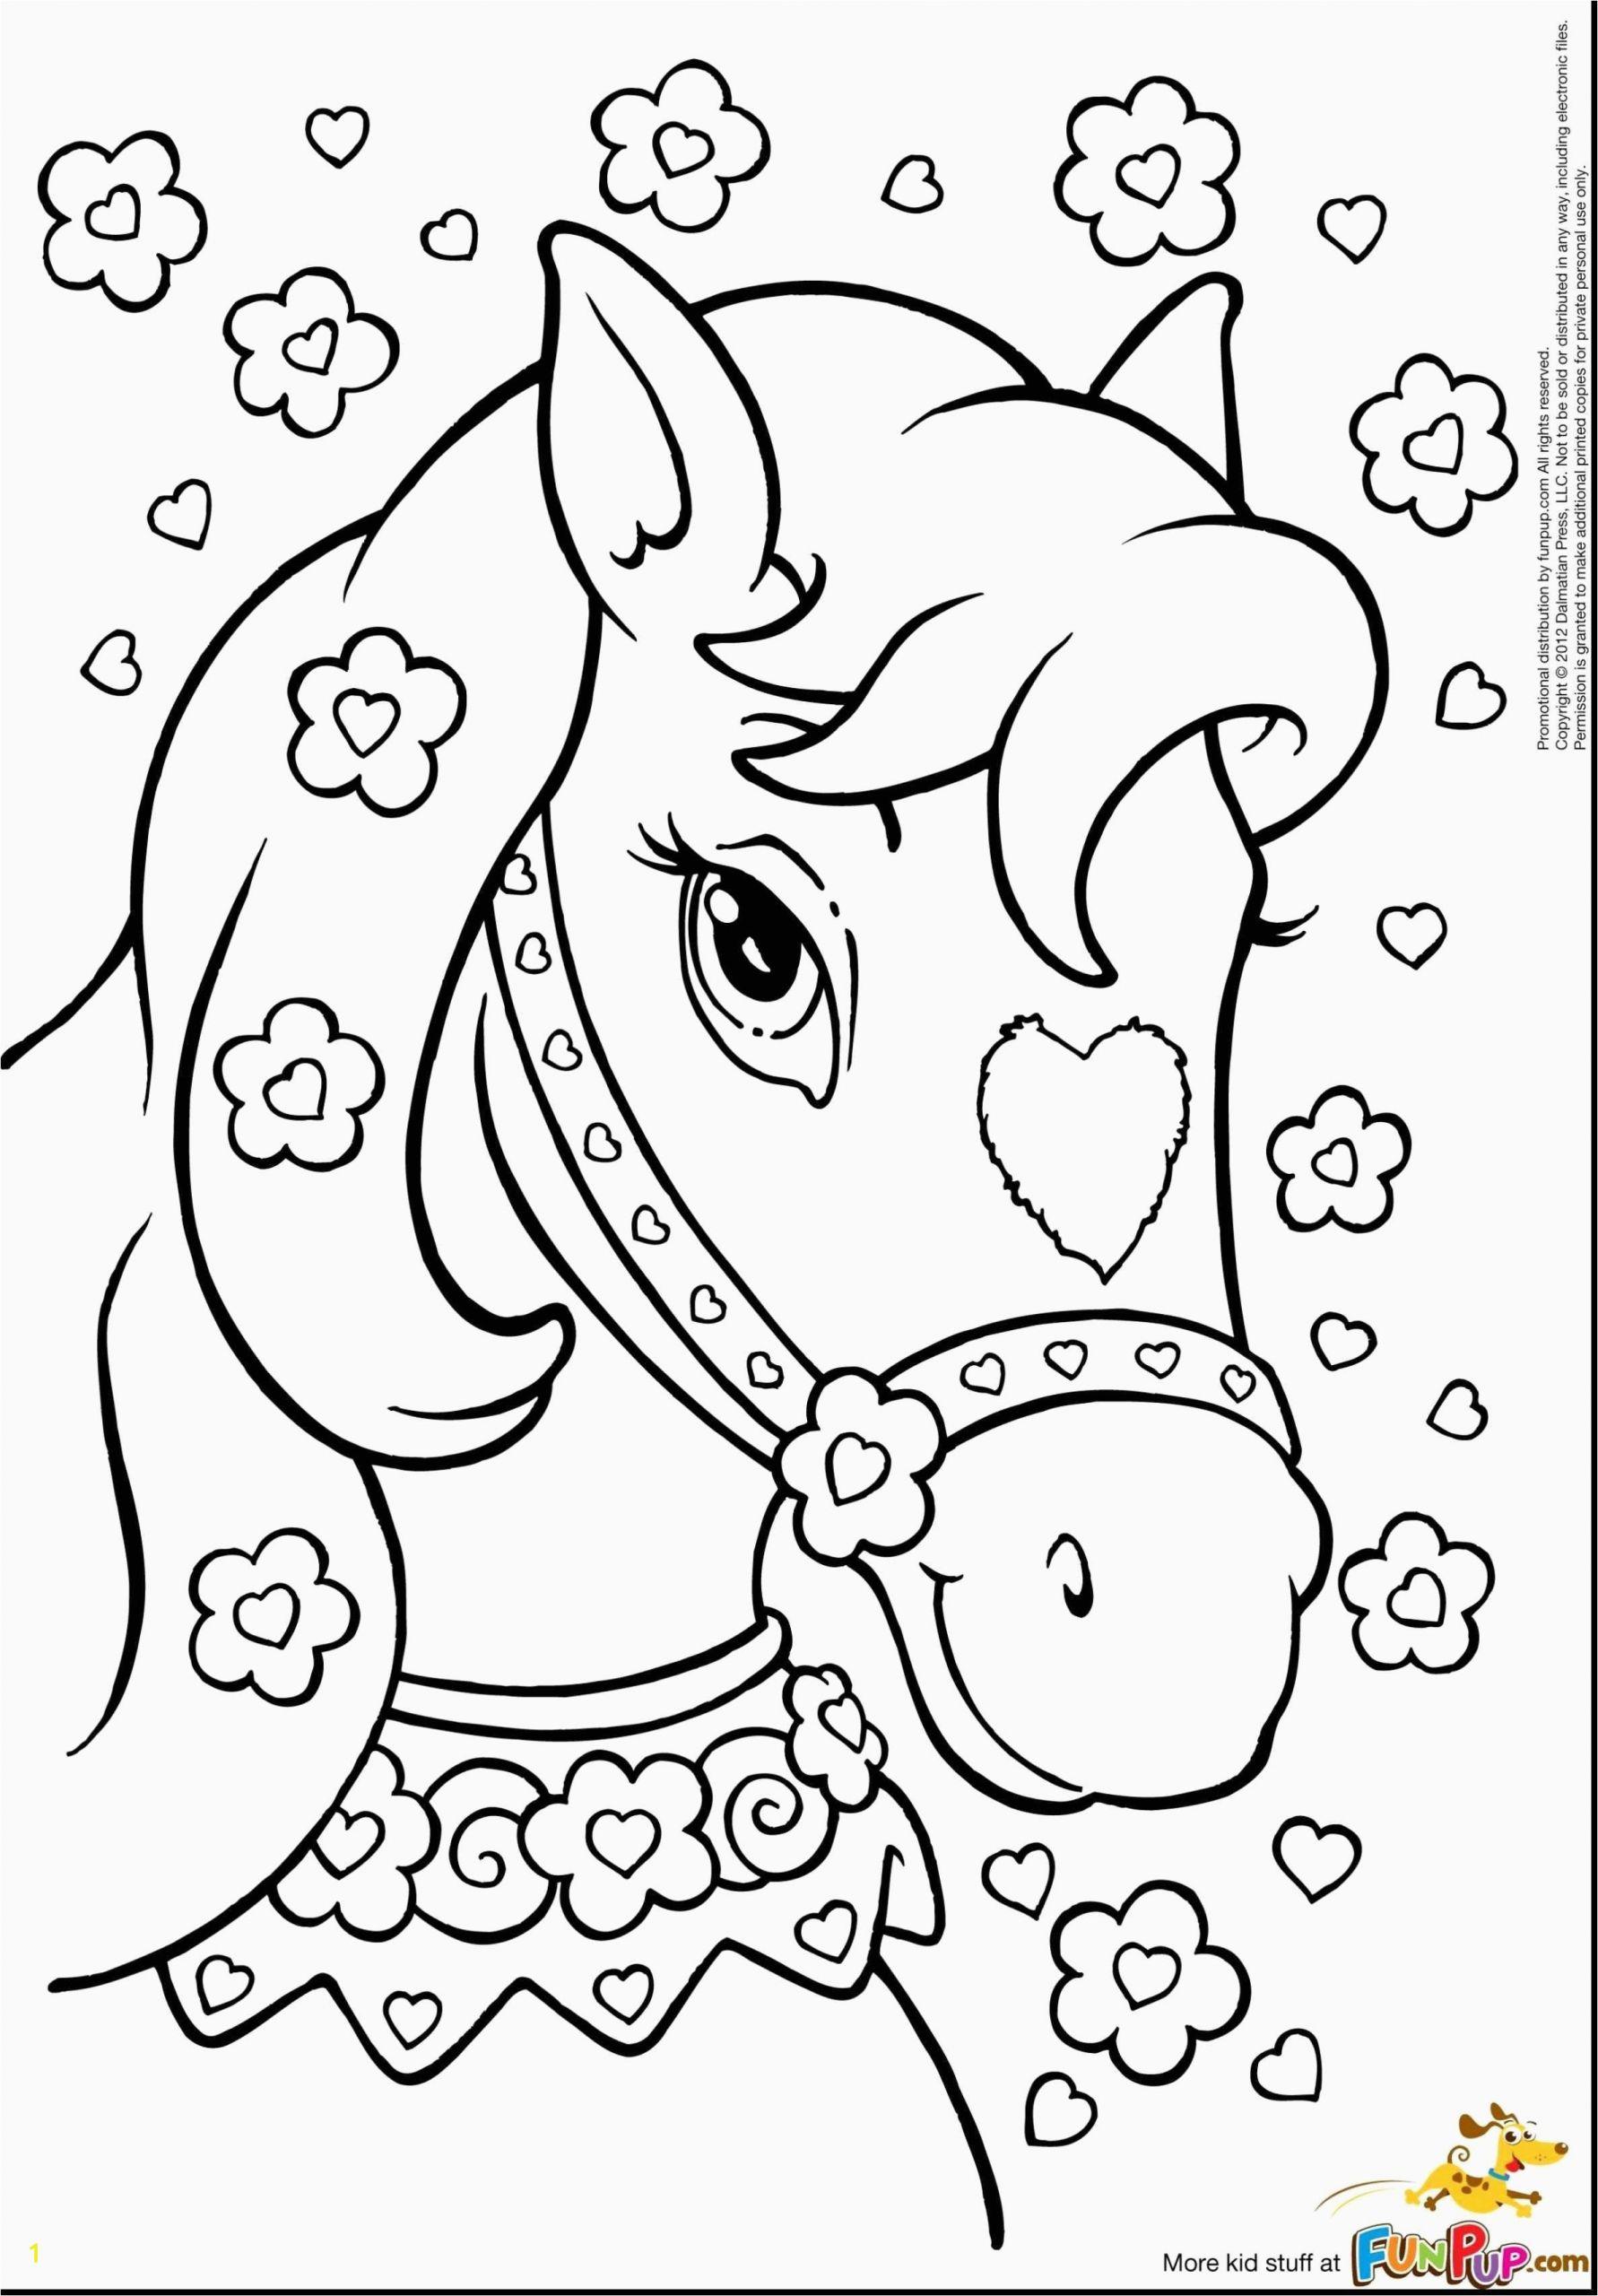 Printing Princess Coloring Pages Coloring African Animals Beautiful Disney Princesses